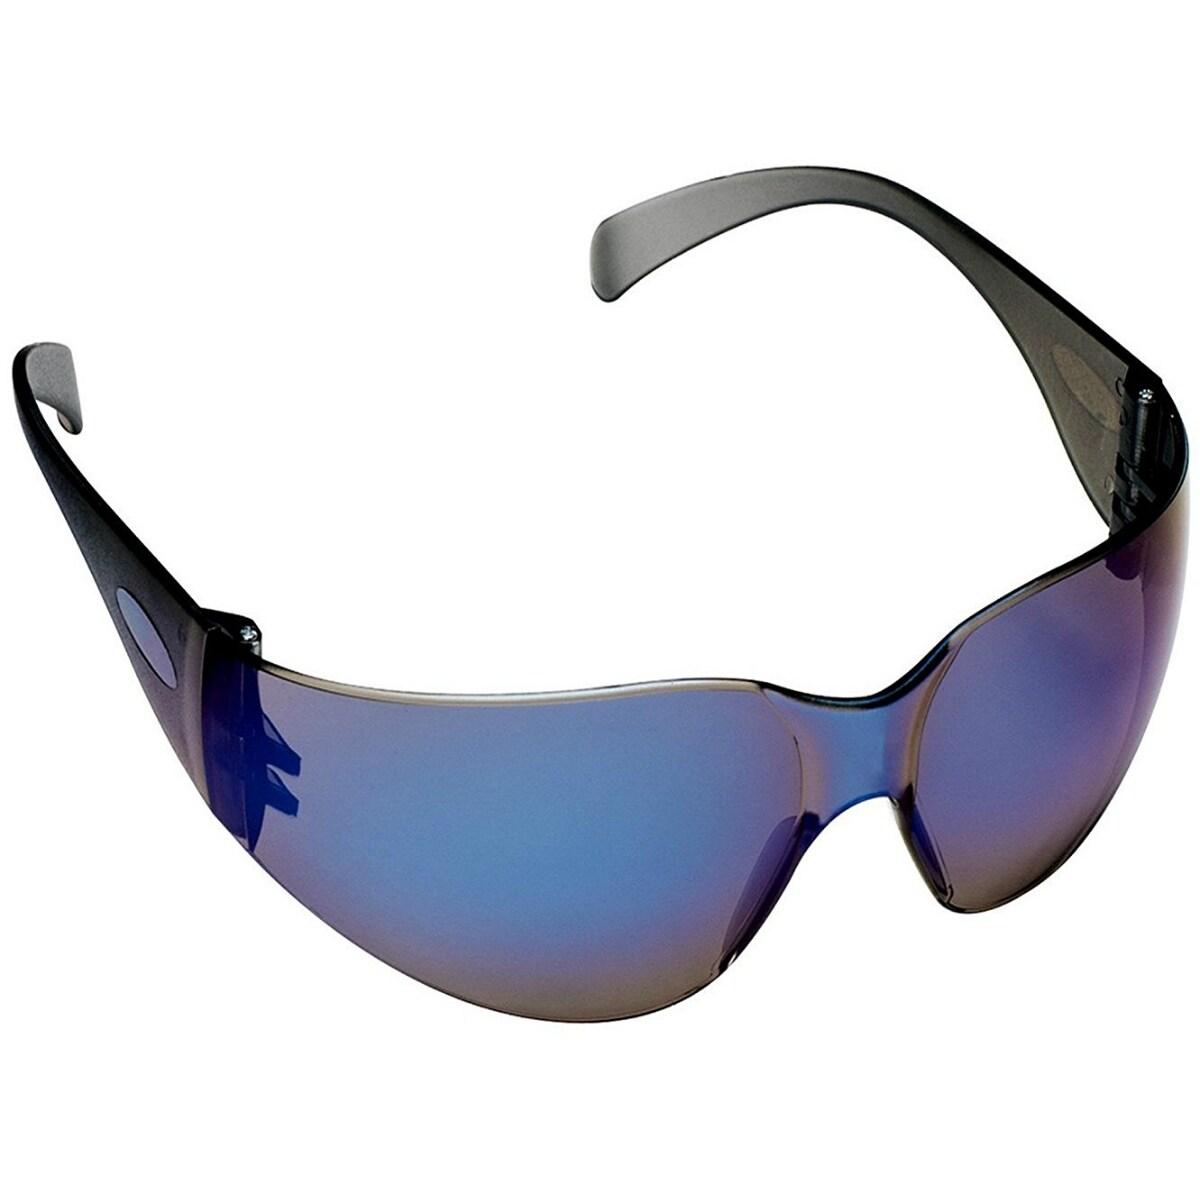 3M 90525-80025T Tekk Protection Virtua Safety Eyewear with Blue Mirror Lens